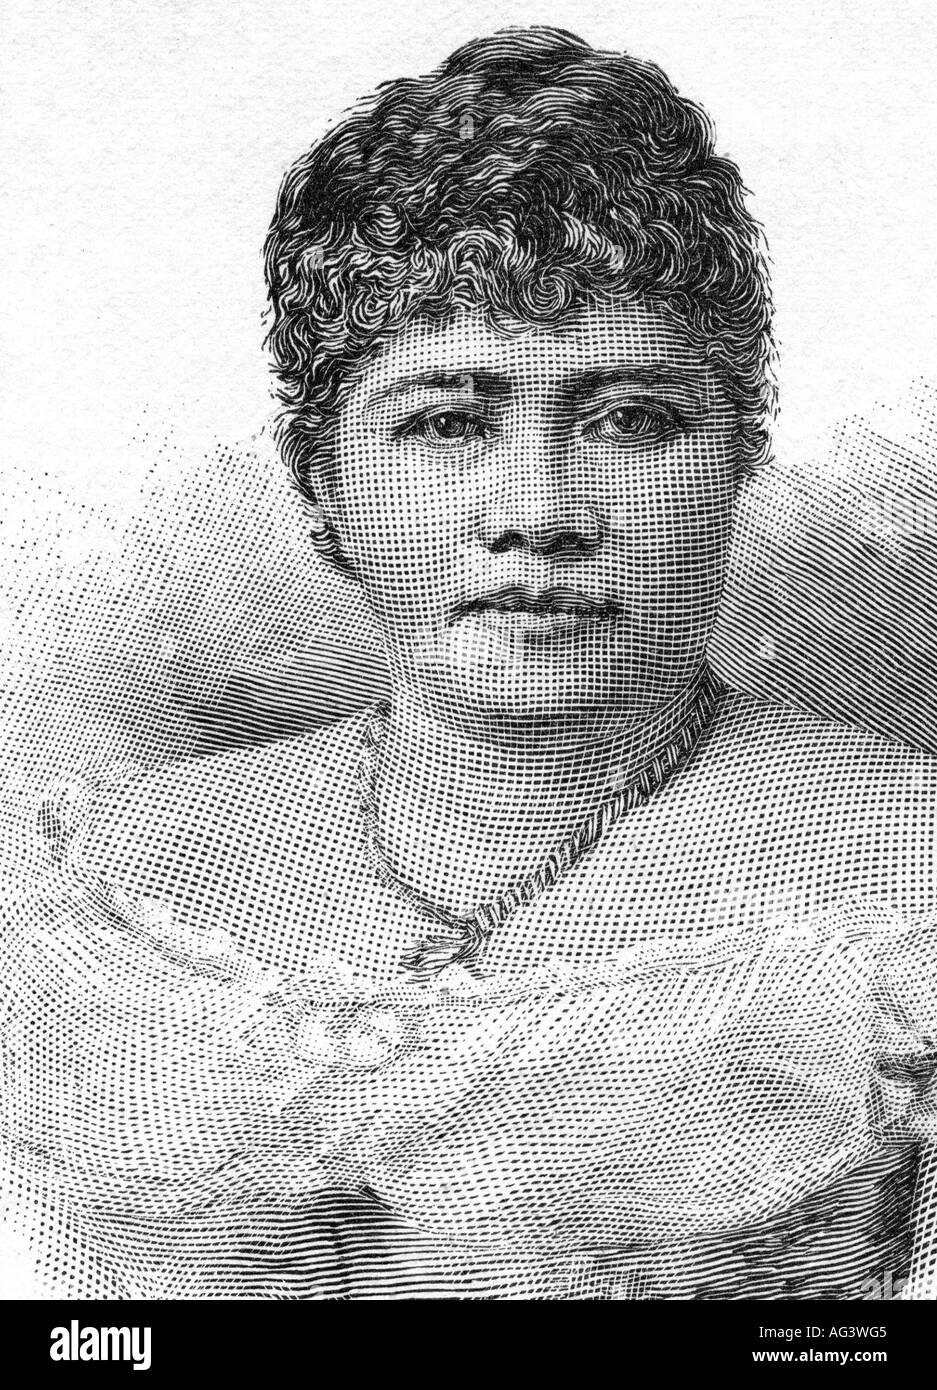 Lili uokalani, 2.9.1838 - 11.11.1917, Queen of Hawaii 17.1.1891 - 11.11.1917, portrait, engraving, circa 1895, Lydia Kamakahea, 19th century, USA, Liliuokalani, Liliuokalami , Additional-Rights-Clearances-NA - Stock Image